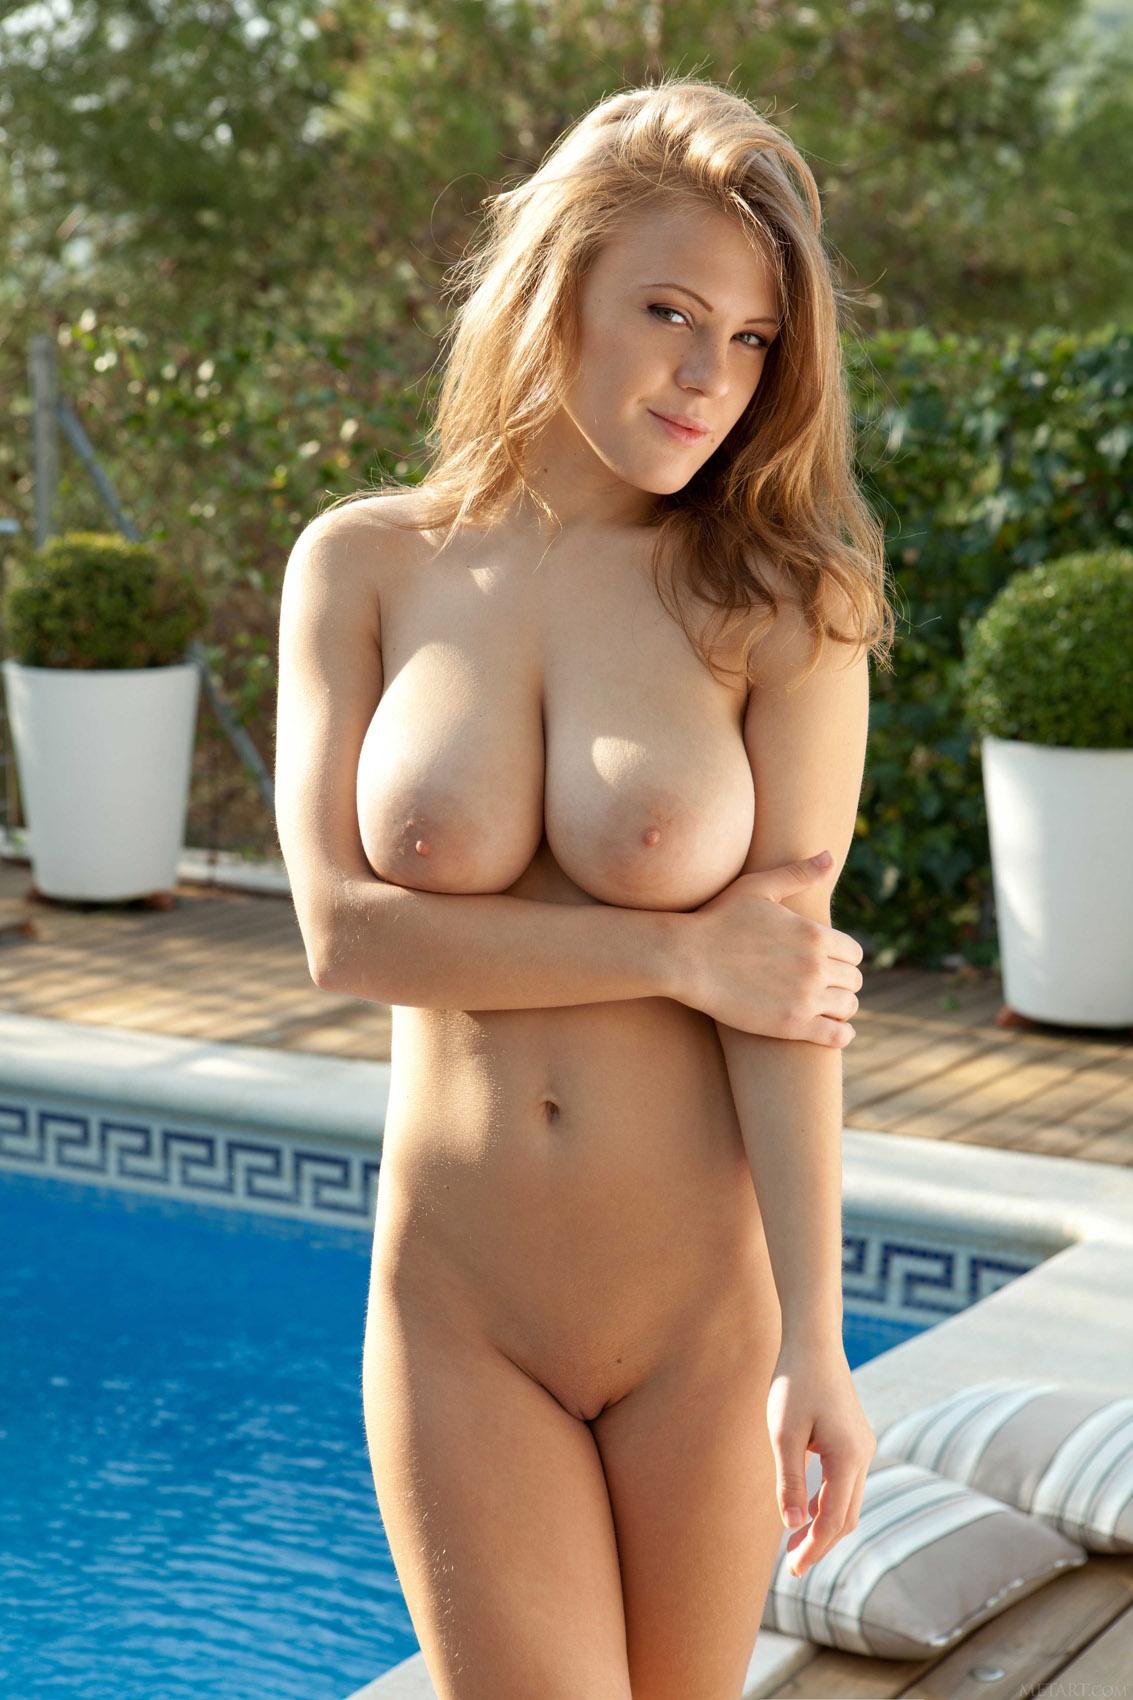 white girl naked pusyy fucks